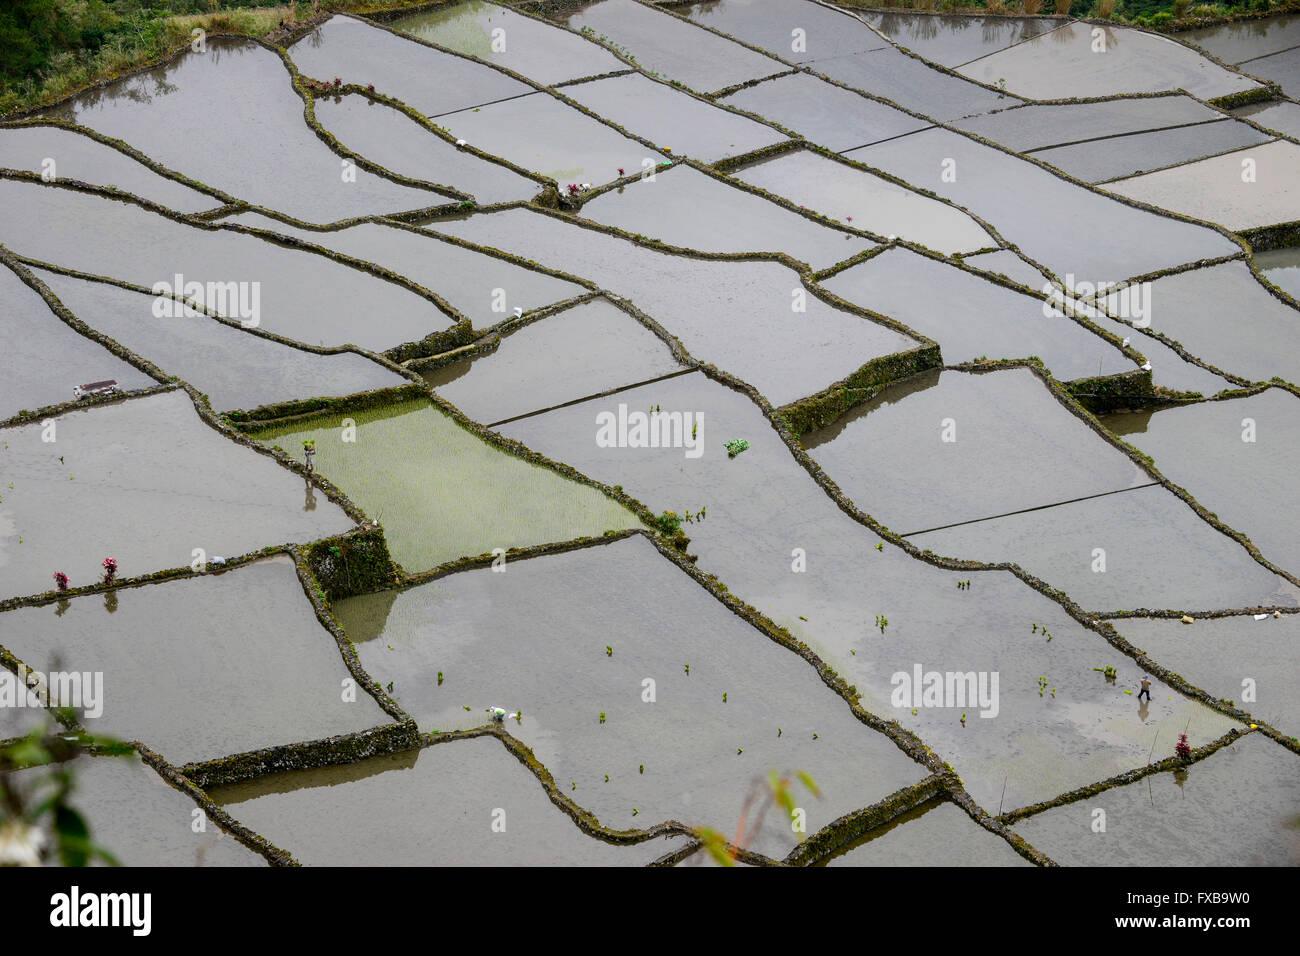 PHILIPPINES, Mountain Province, Cordilleras, rice farming on rice terrace in mountains near Bayyo / PHILIPPINEN, - Stock Image